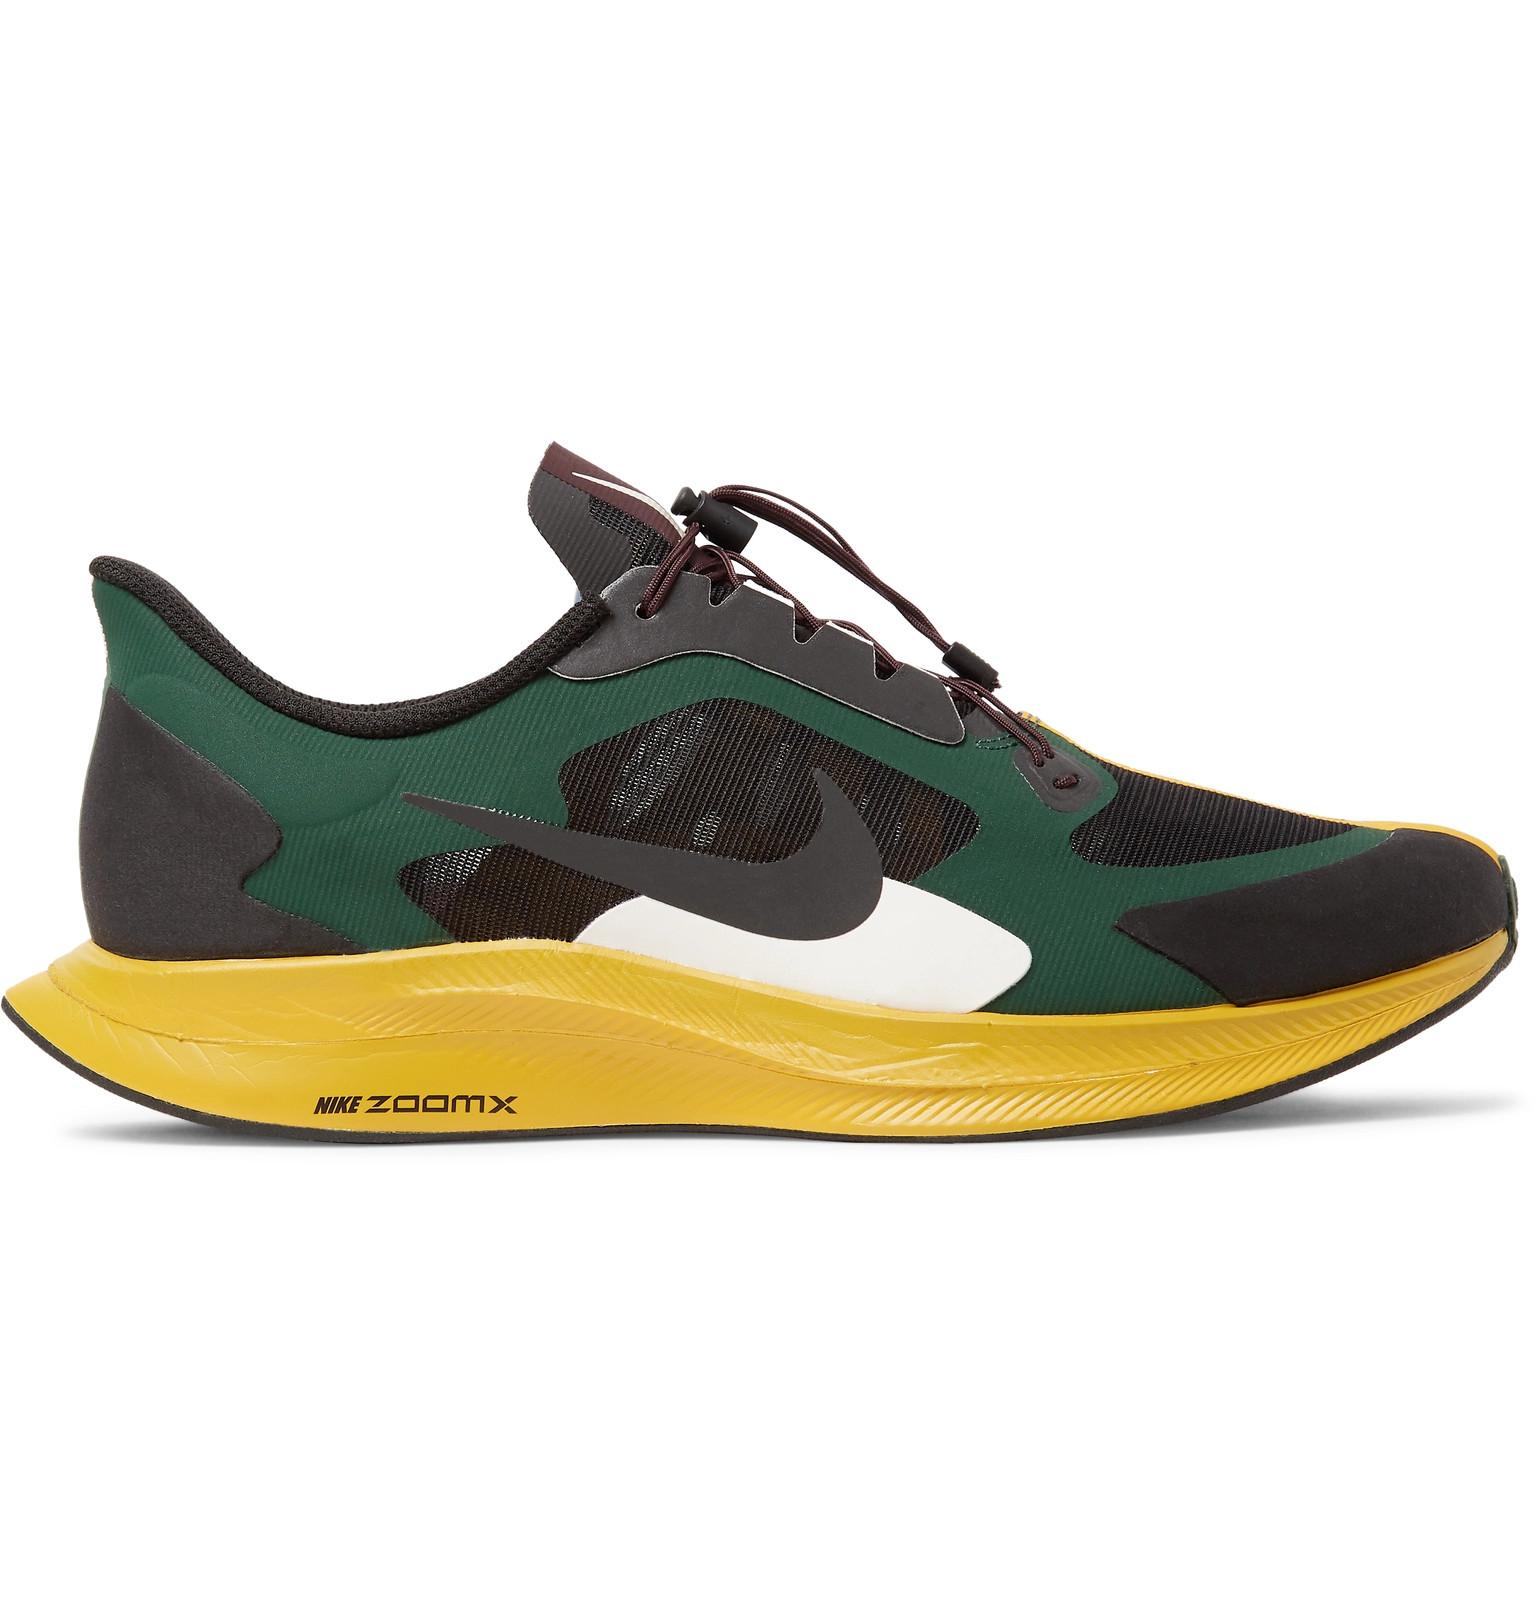 a6c541a1f363e Nike x Undercover+ GYAKUSOU Zoom Pegasus Turbo Mesh Sneakers